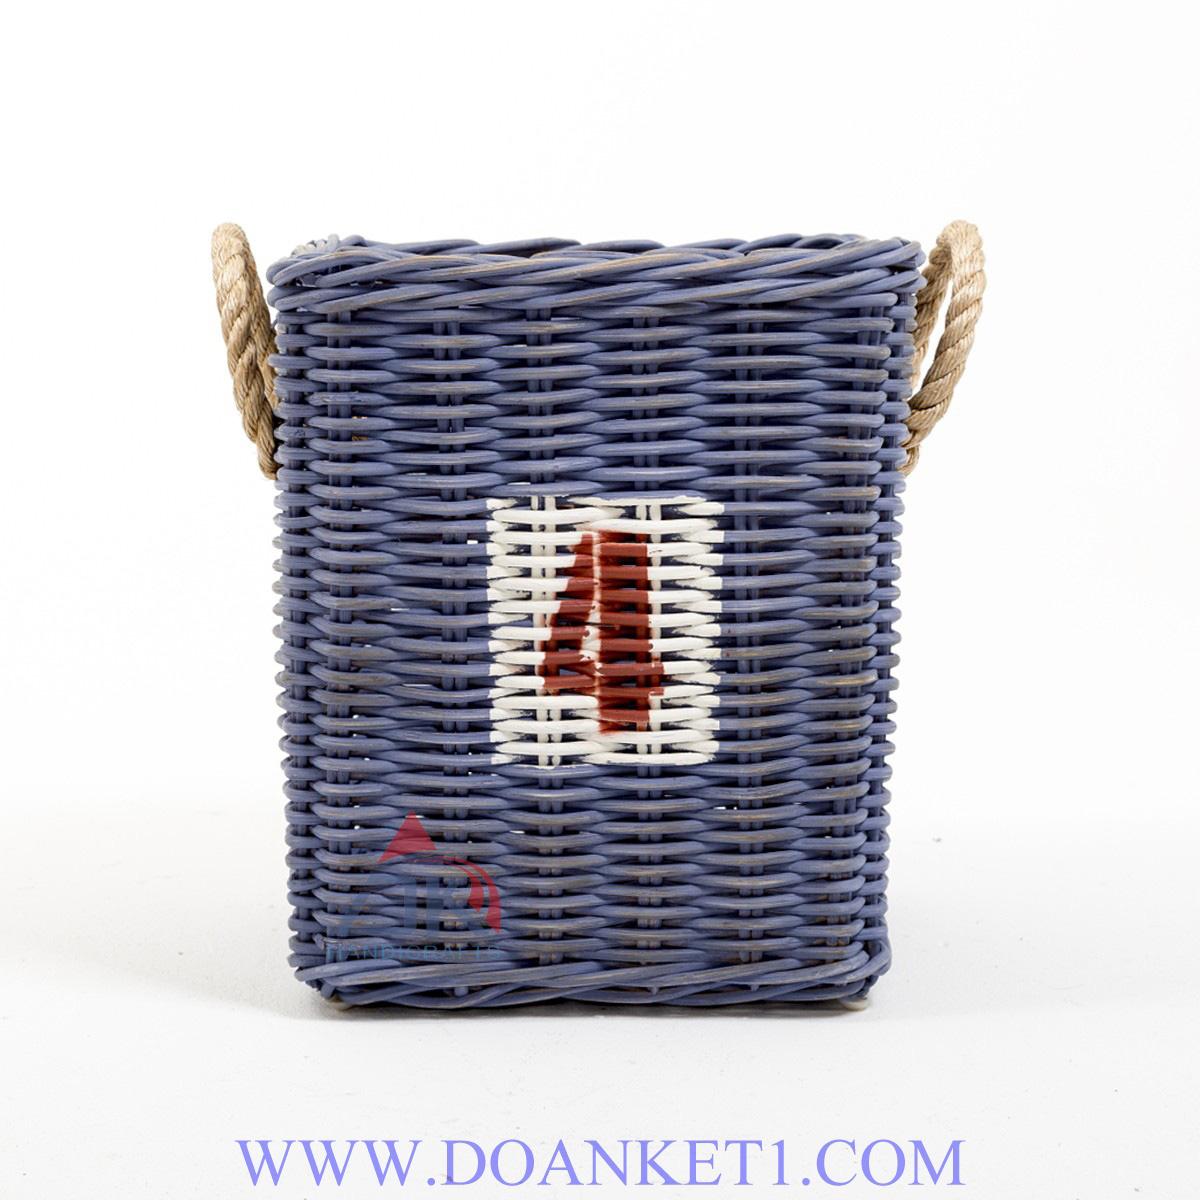 RATTAN BASKET # DK103